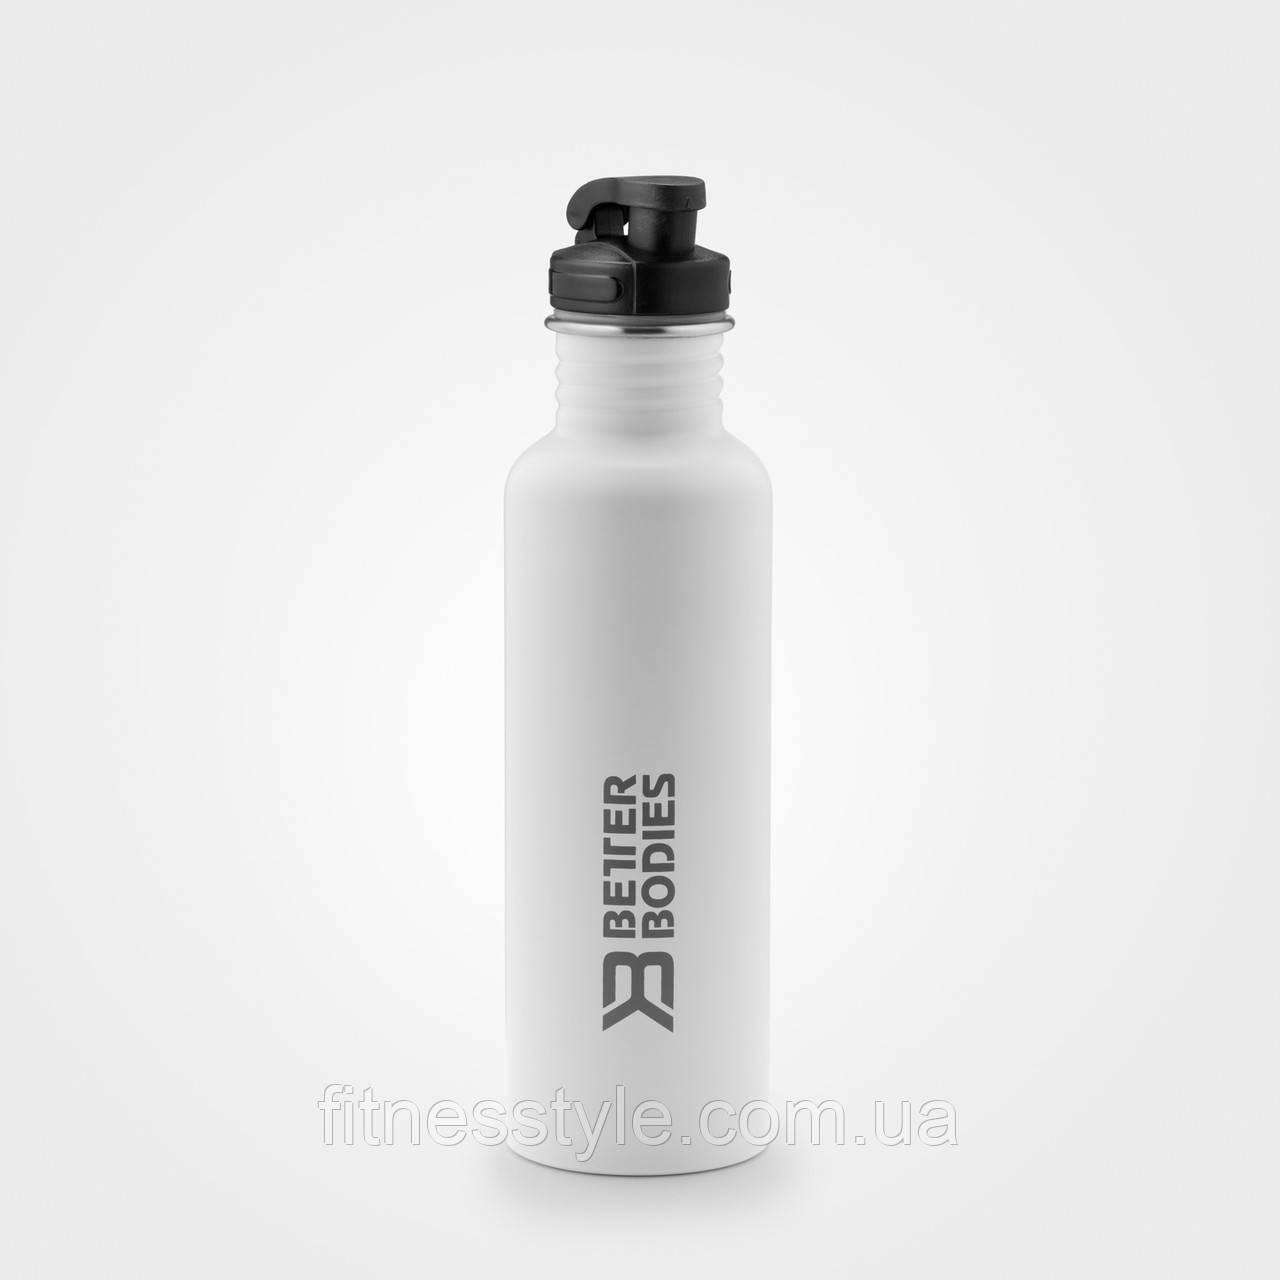 Бутылка для воды Better Bodies Fulton bottle, White